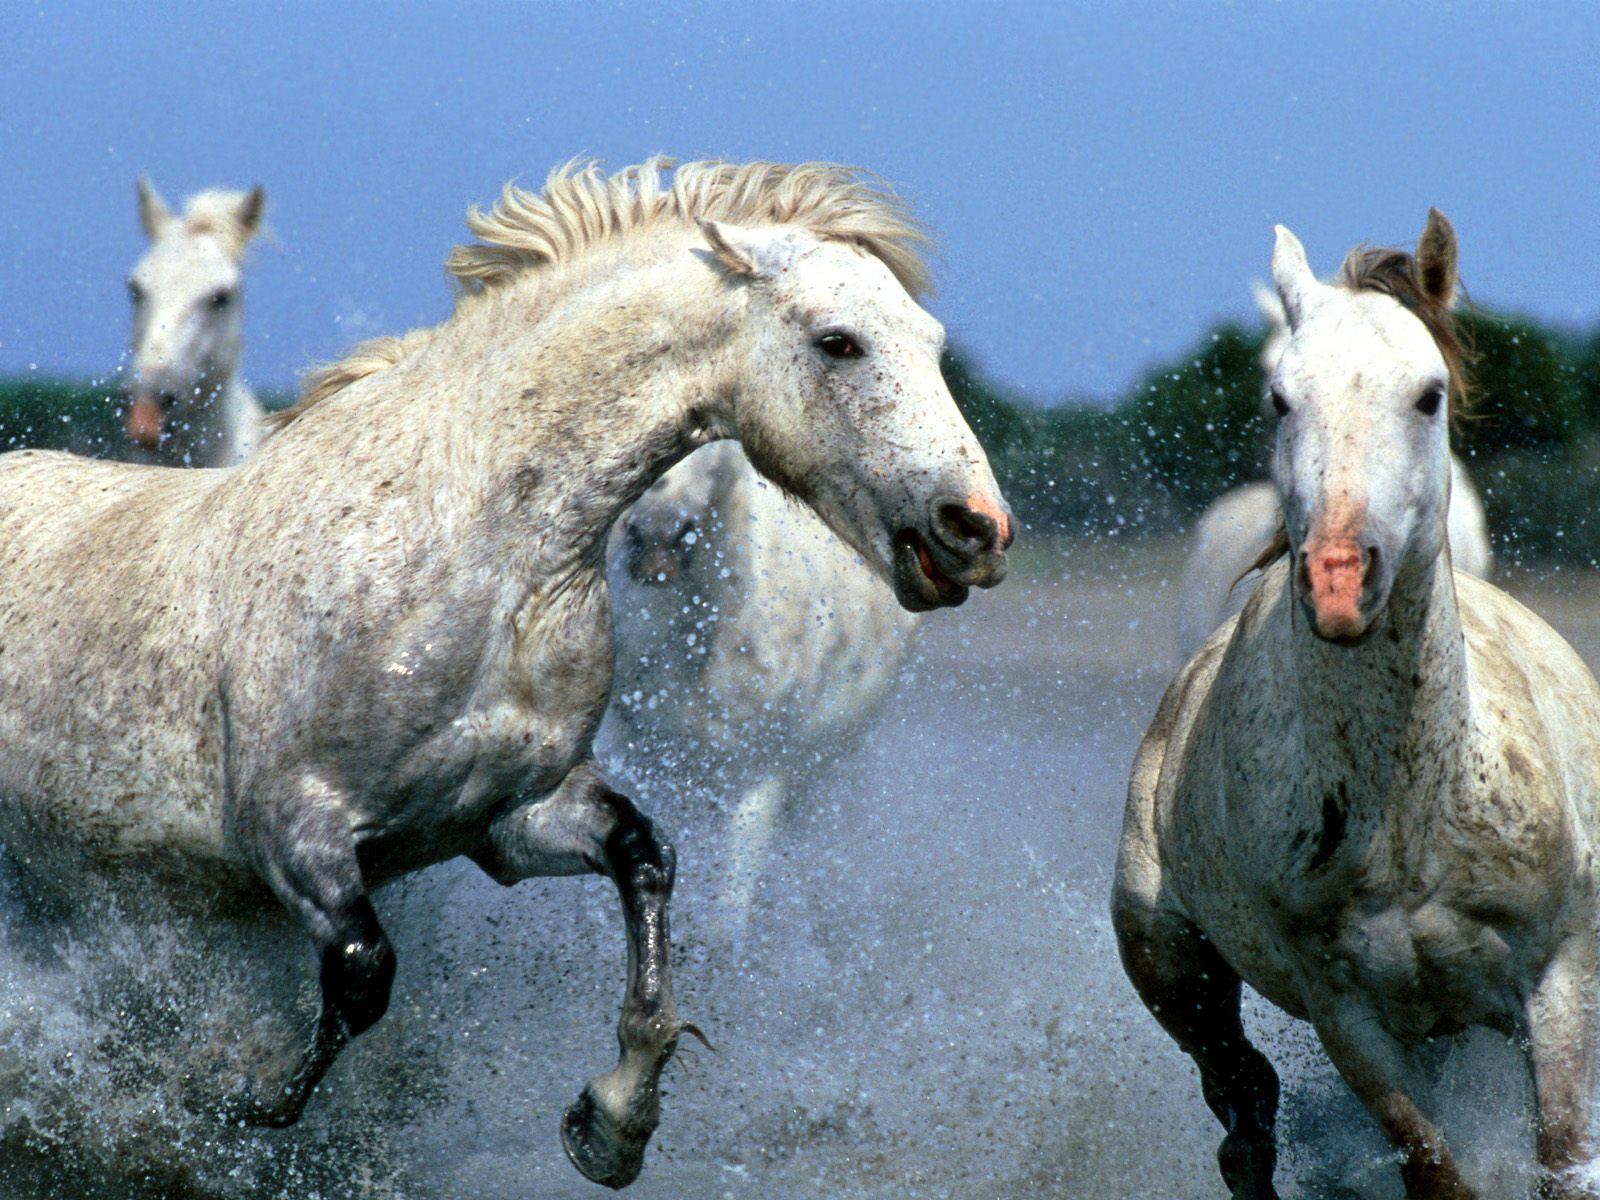 animals zoo park horses wallpapers for desktop